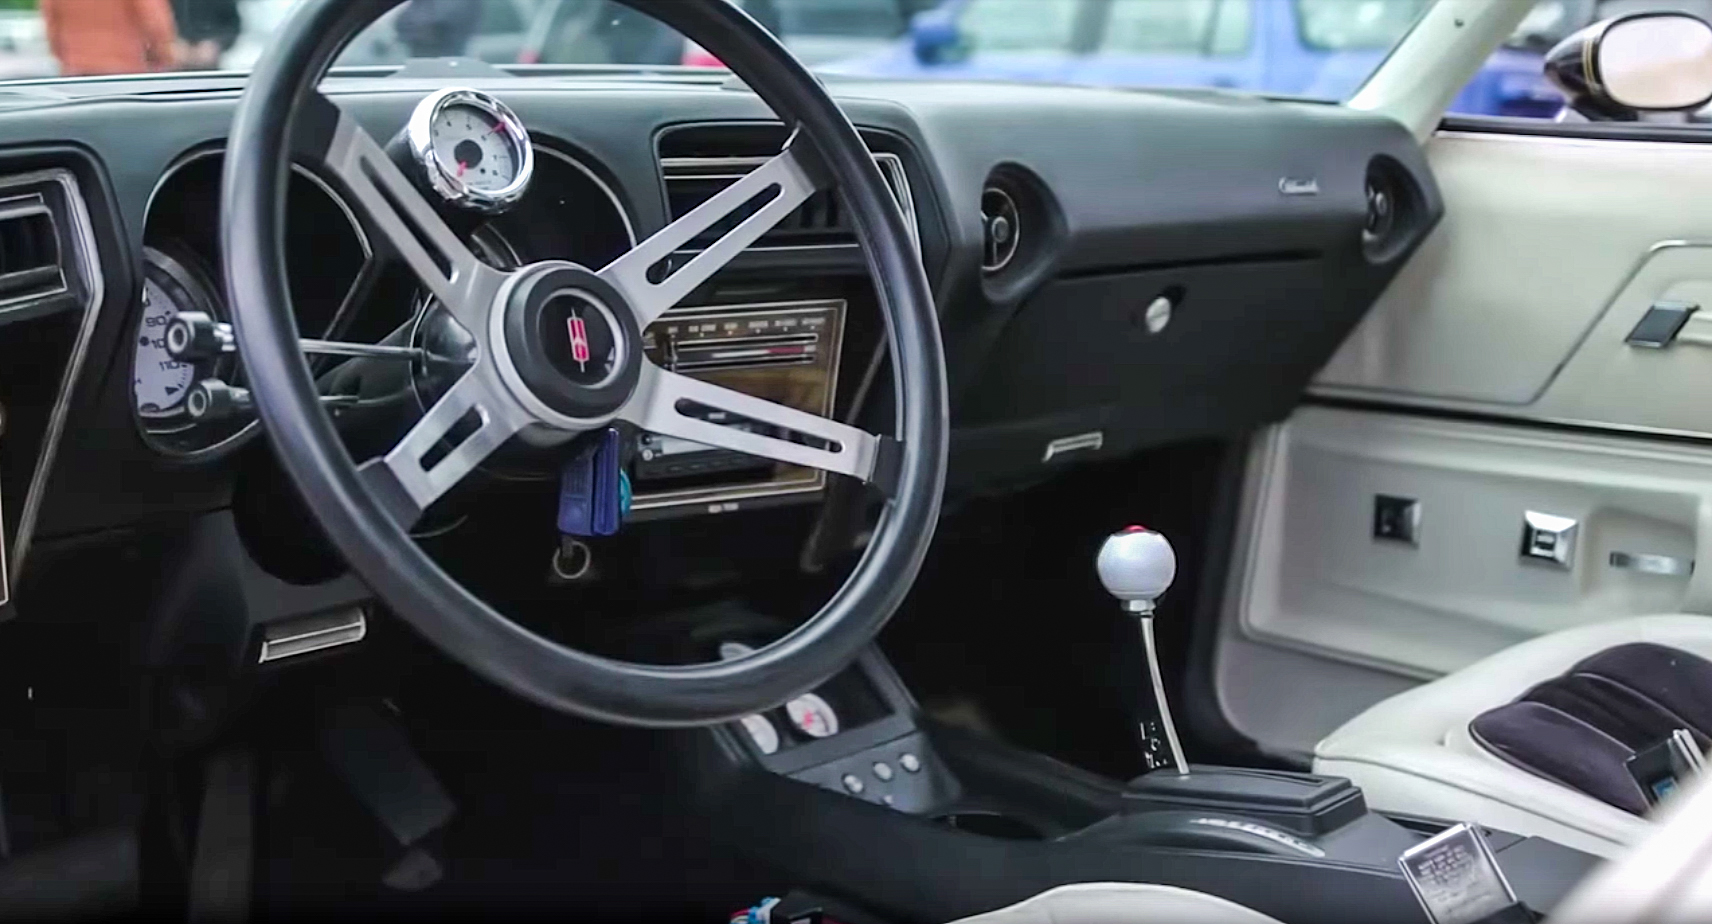 1975 Hurst Oldsmobile Colonnade W-30 Interior Steering wheel